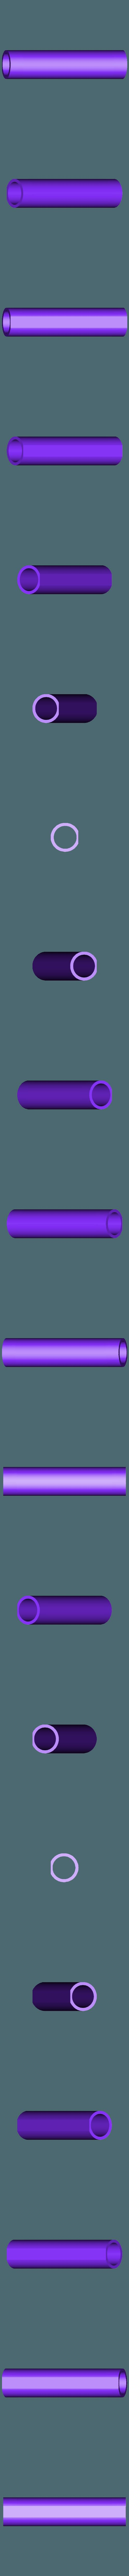 Barrell_BL_Back.stl Télécharger fichier STL gratuit Borderlands Bandit Room Clener Shotgun • Modèle pour impression 3D, Dsk